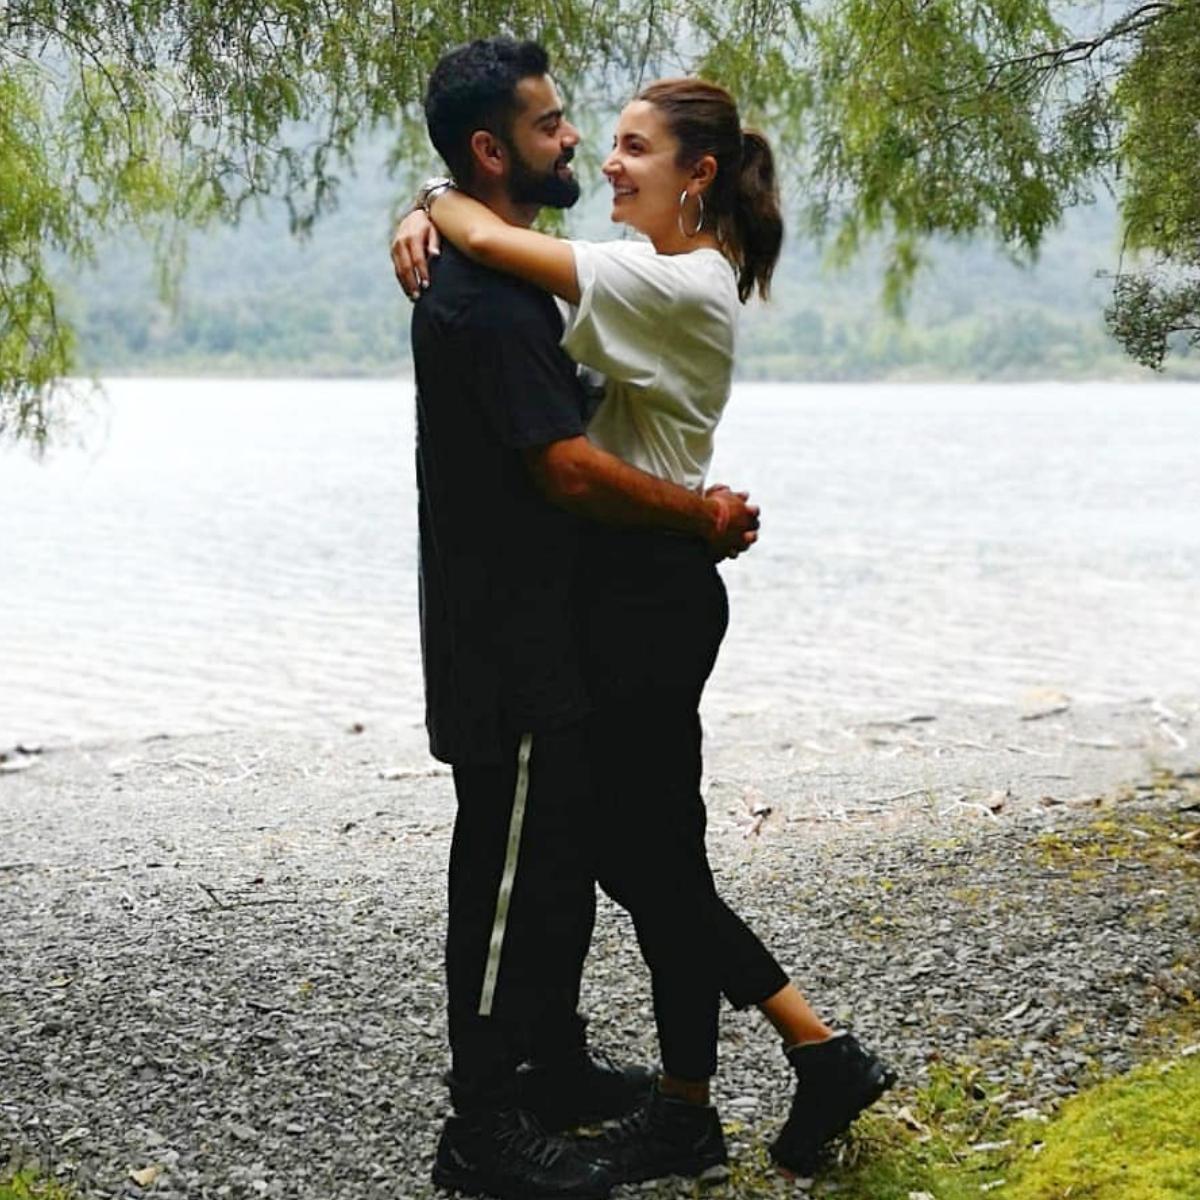 Anushka Sharma along with Virat Kohli are still adorable couples